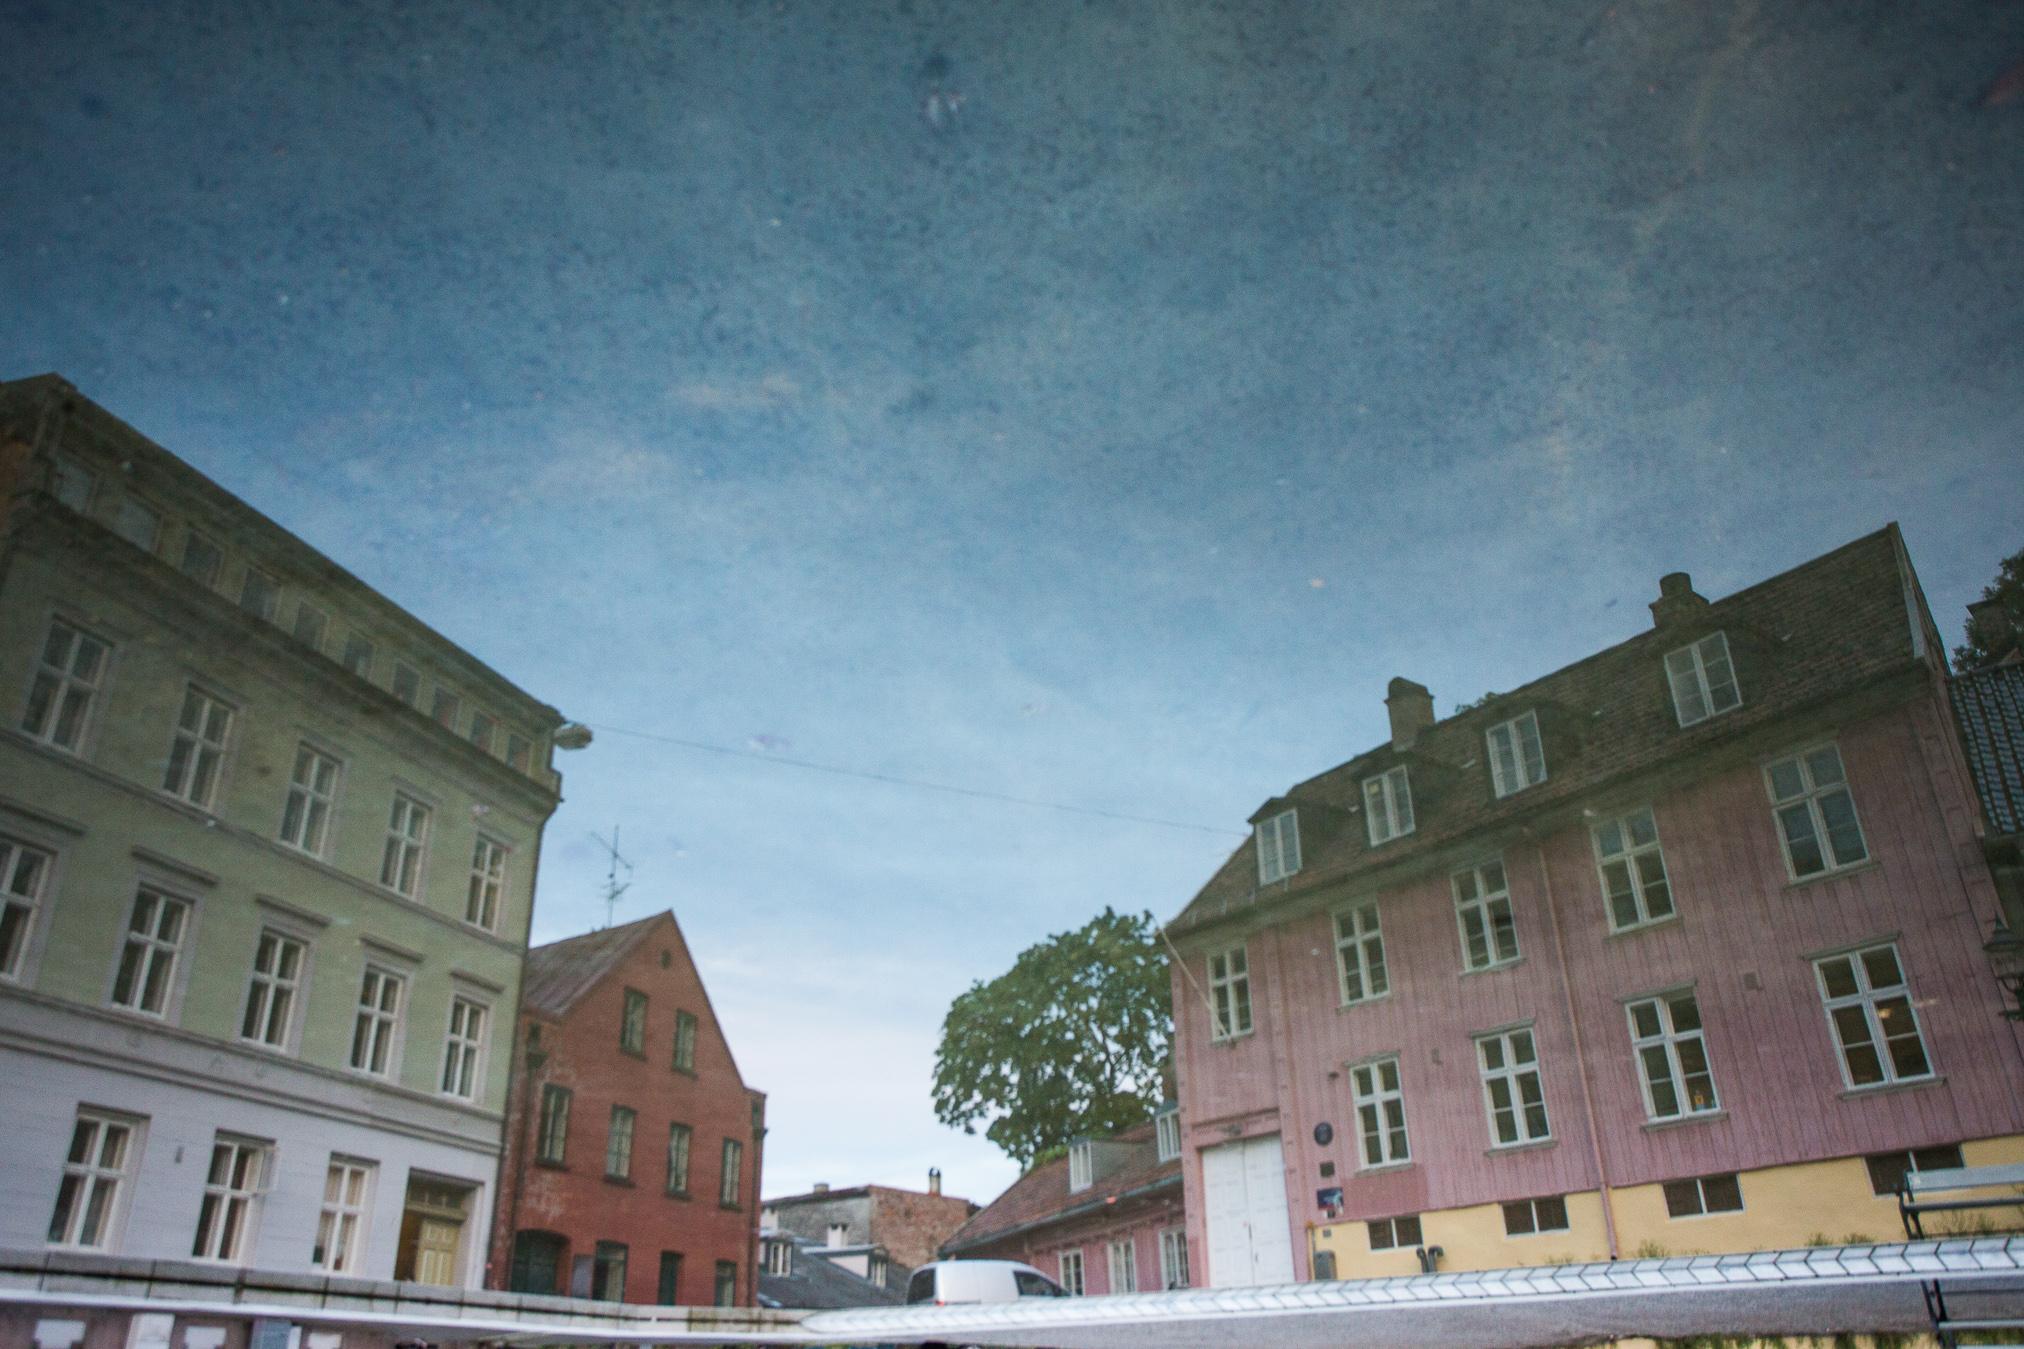 060815_fausko_oslo_damstredet_cityscape-2.jpg